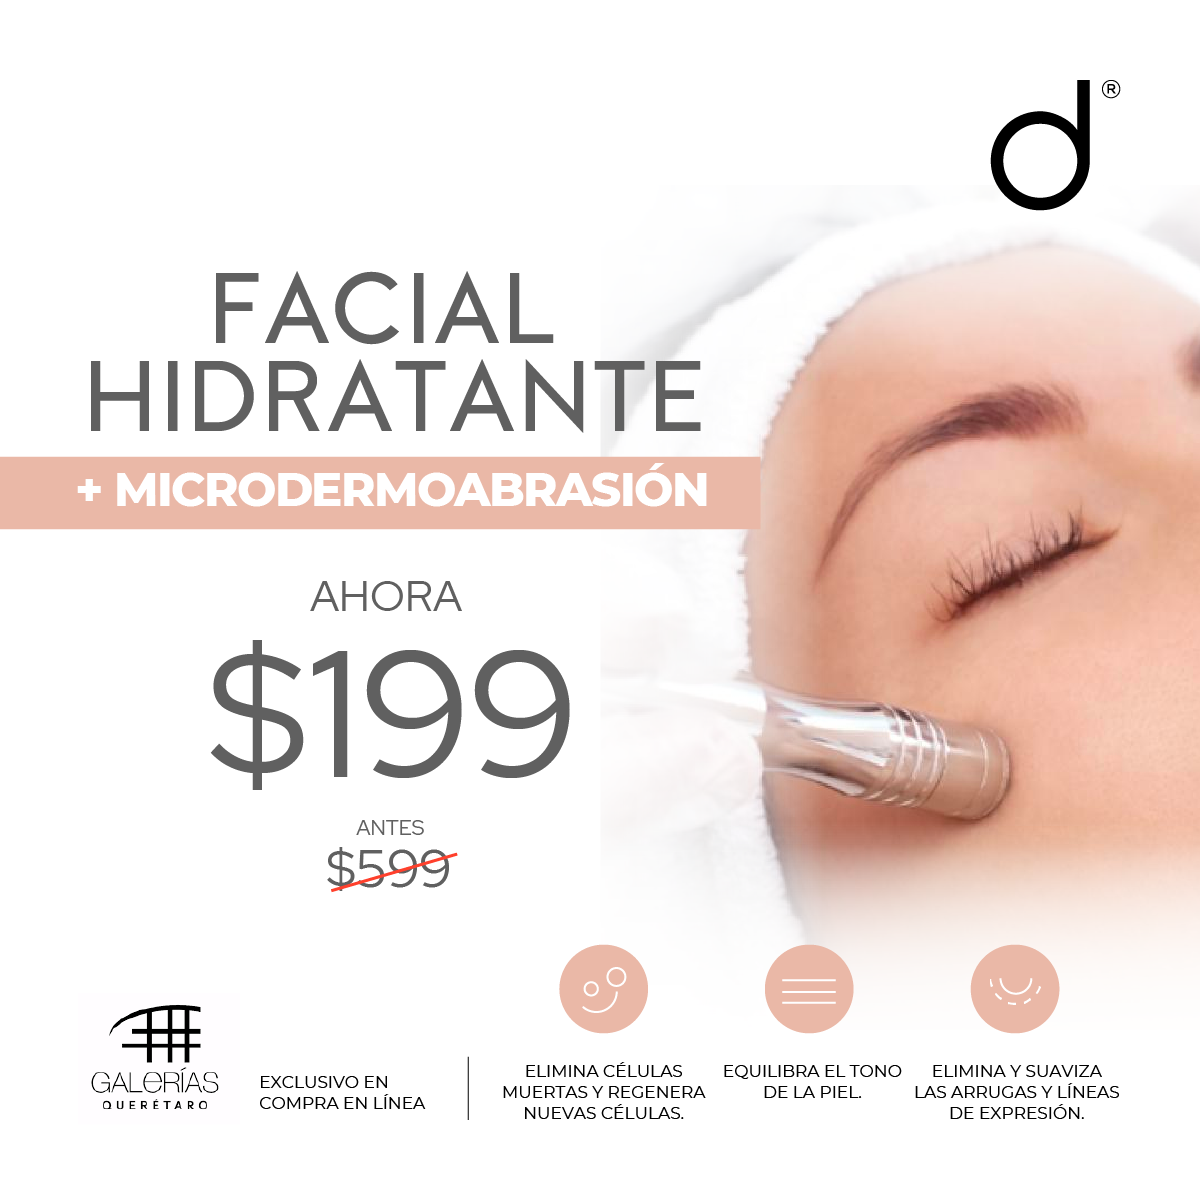 Facial Hidratante + Microdermoabrasión- SÓLO GALERÍAS QUERÉTARO&w=900&h=900&fit=crop